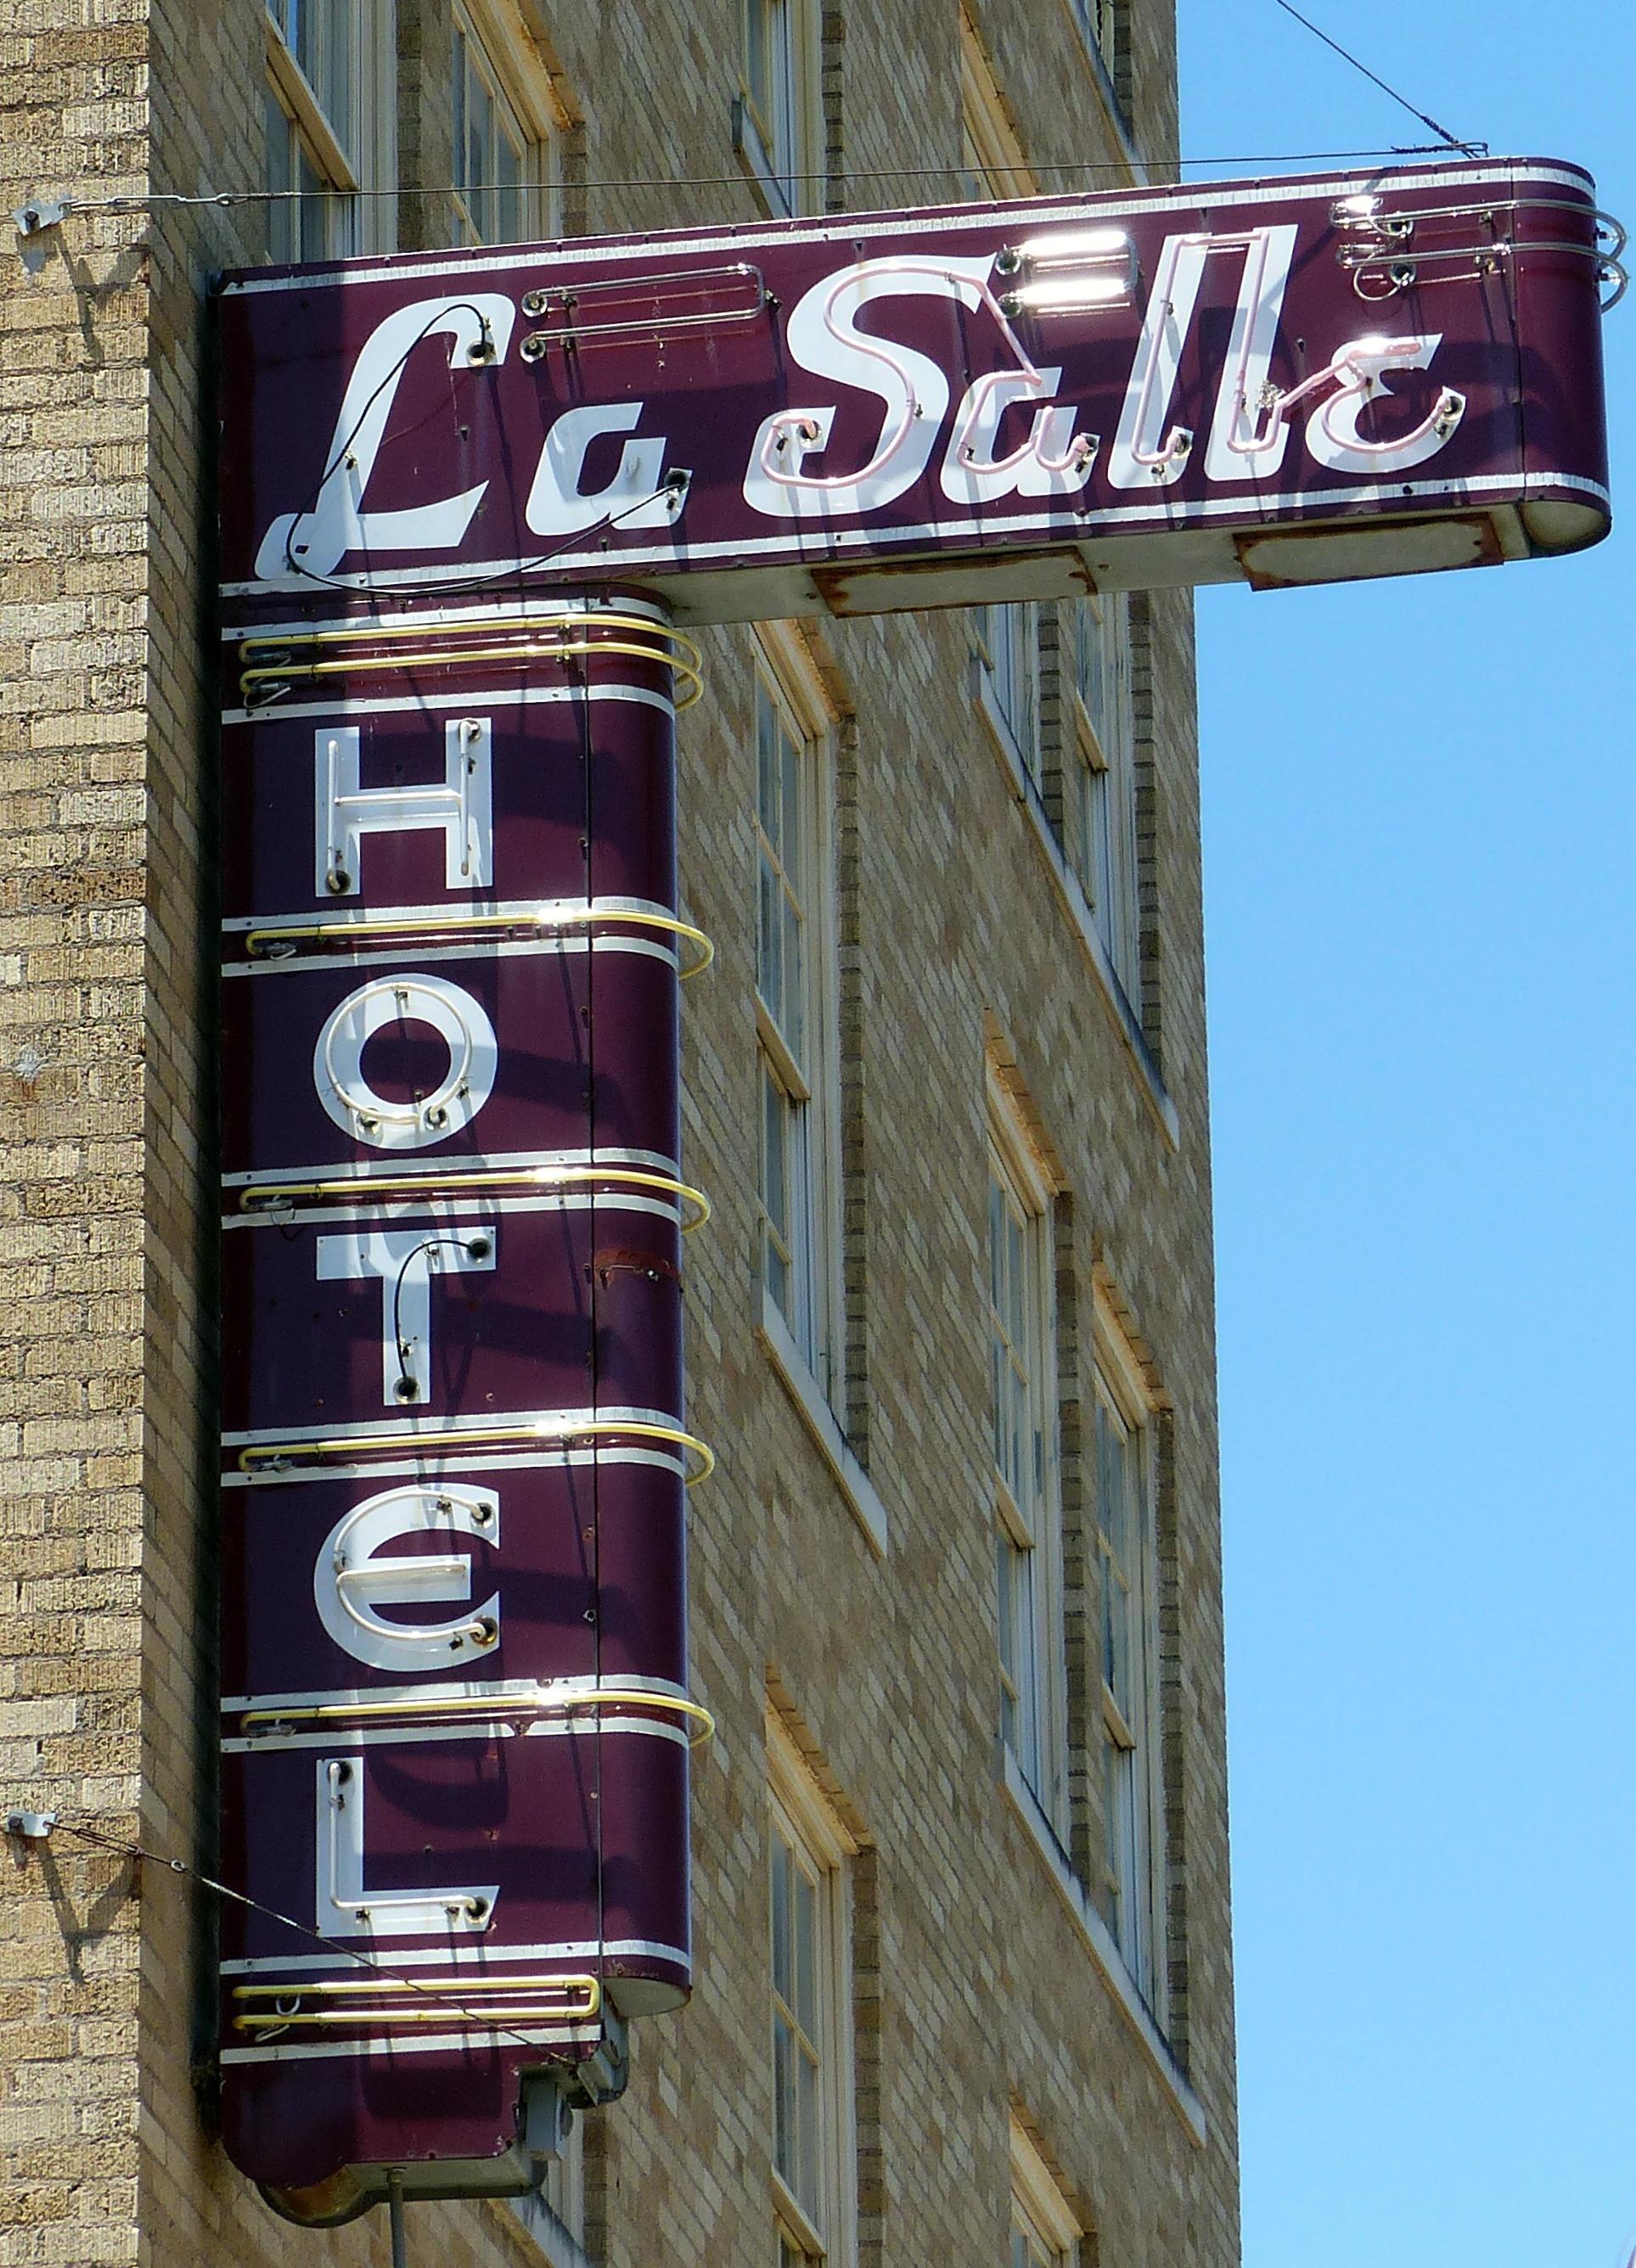 LaSalle Hotel - 120 South Main Street, Bryan, Texas U.S.A. - May 25, 2017